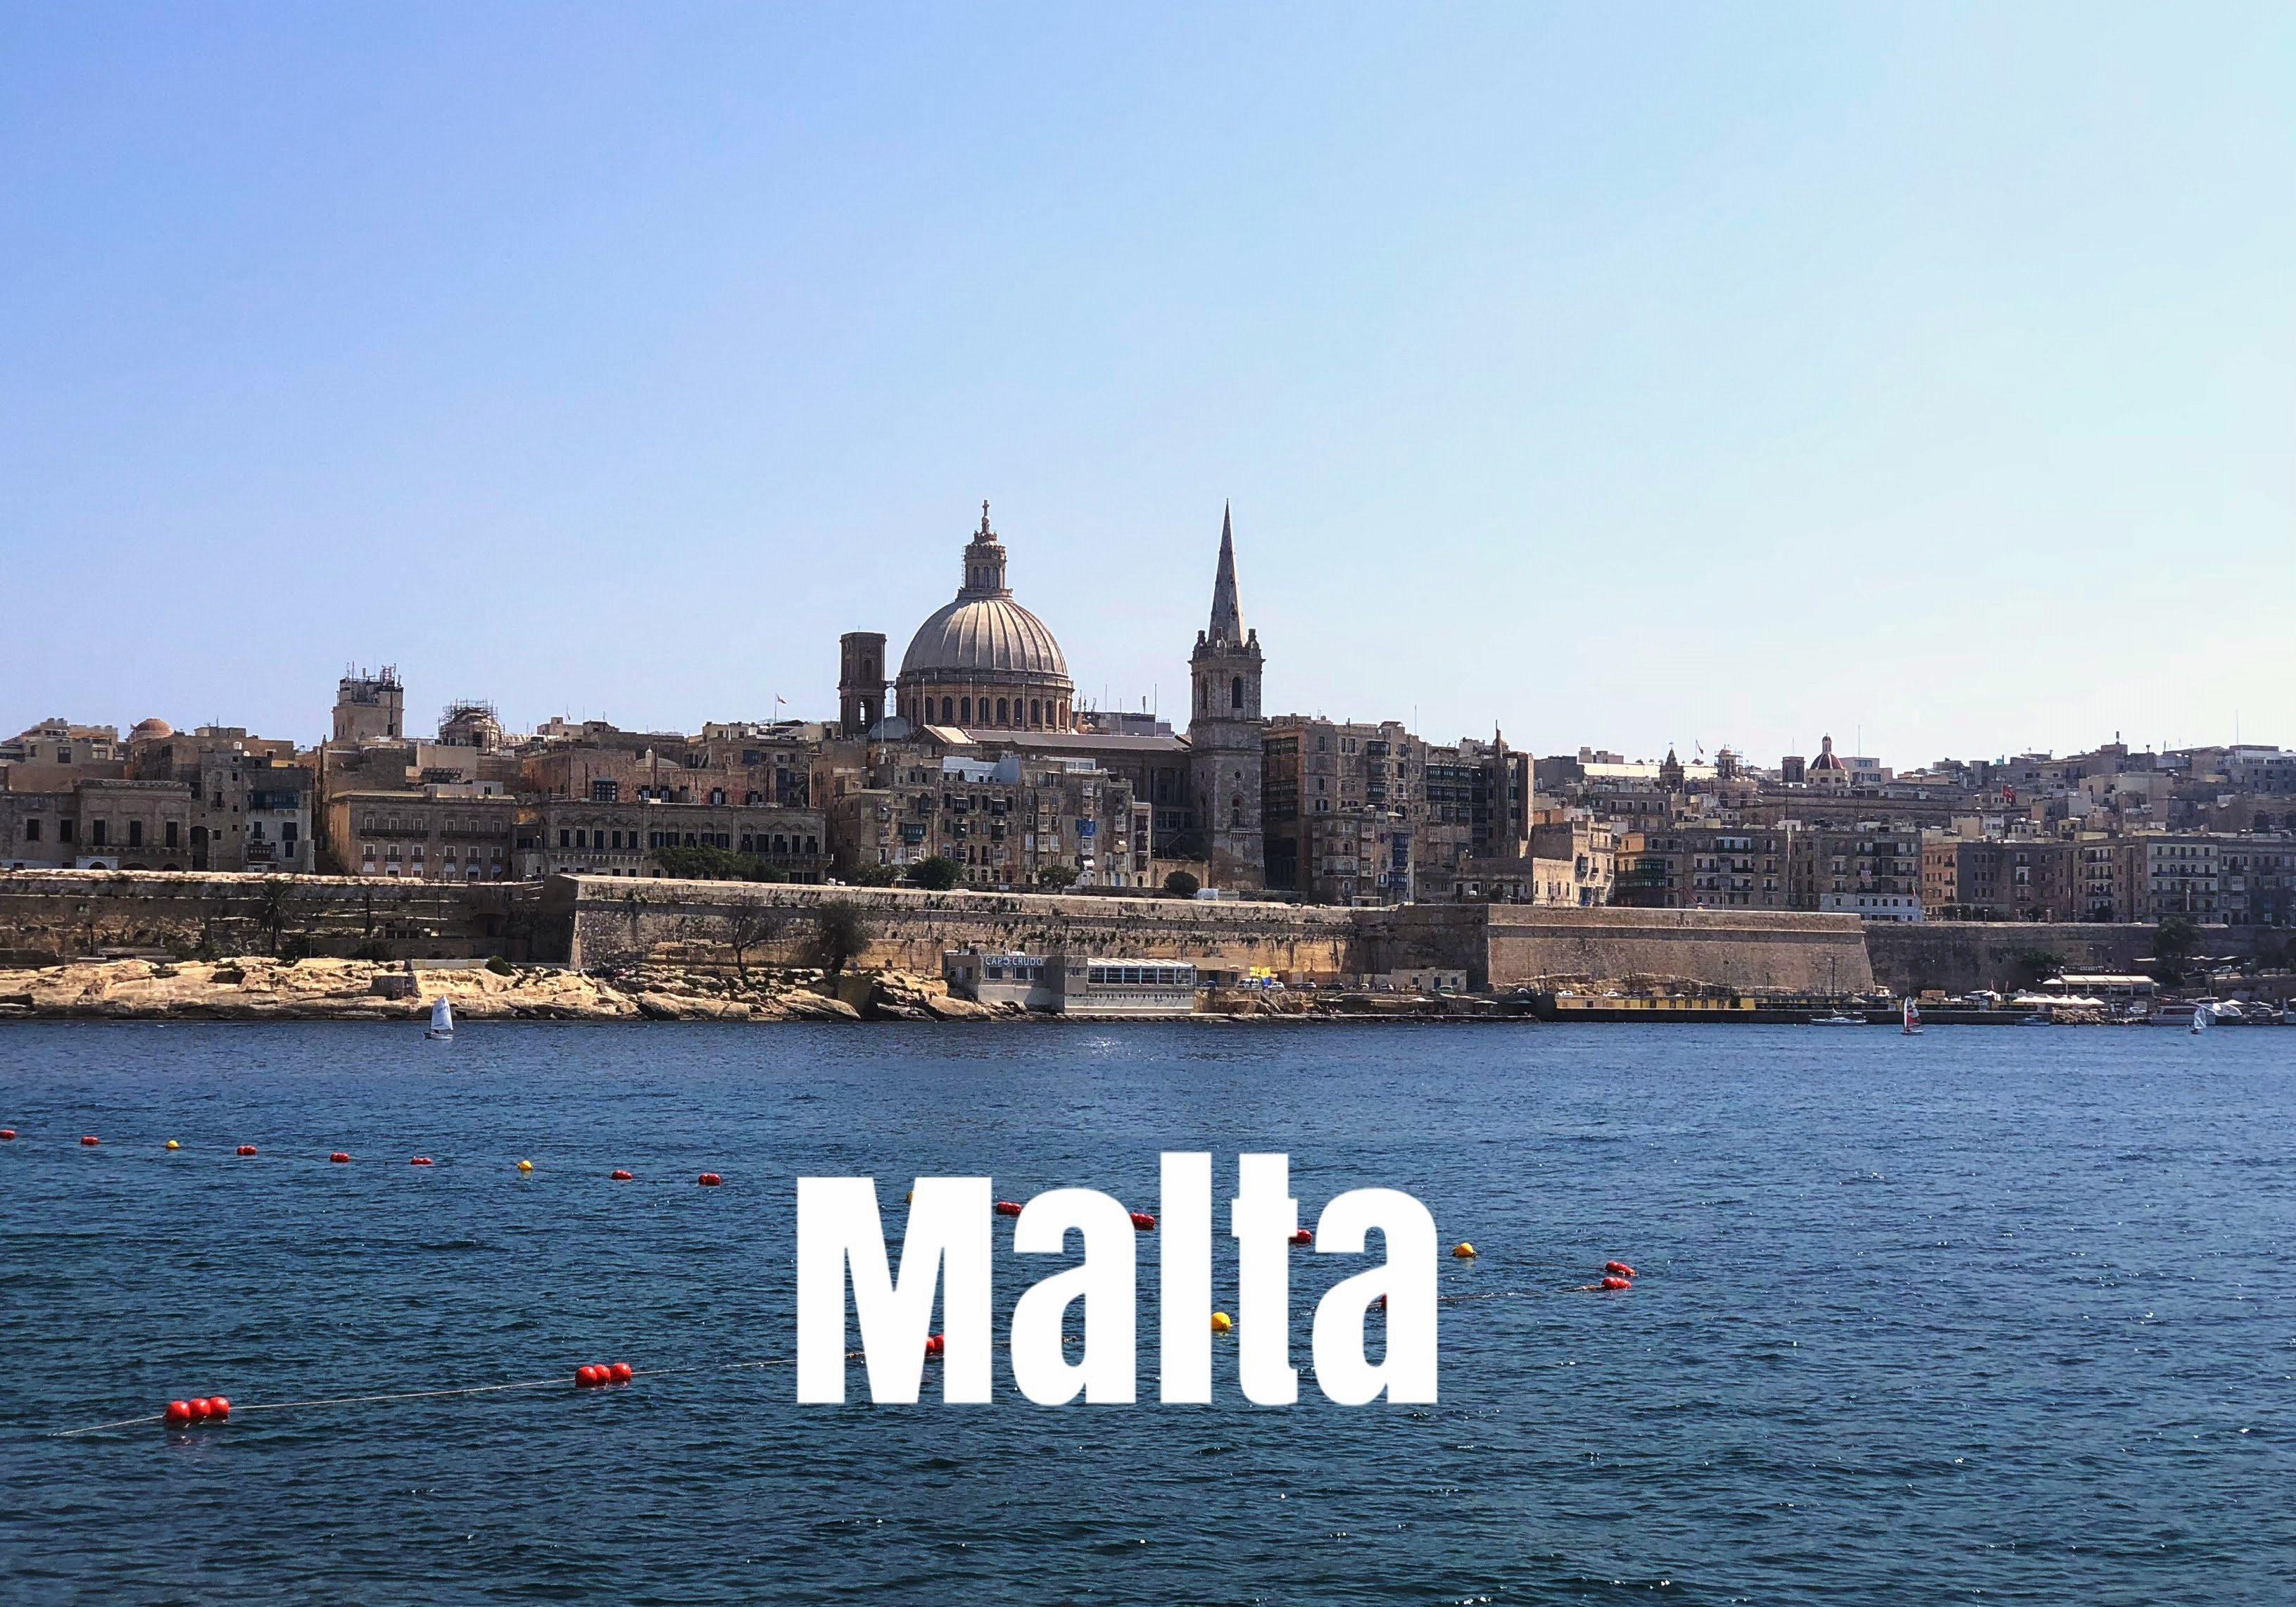 Malta, wanderdaze, blog, travelling, travel blog,